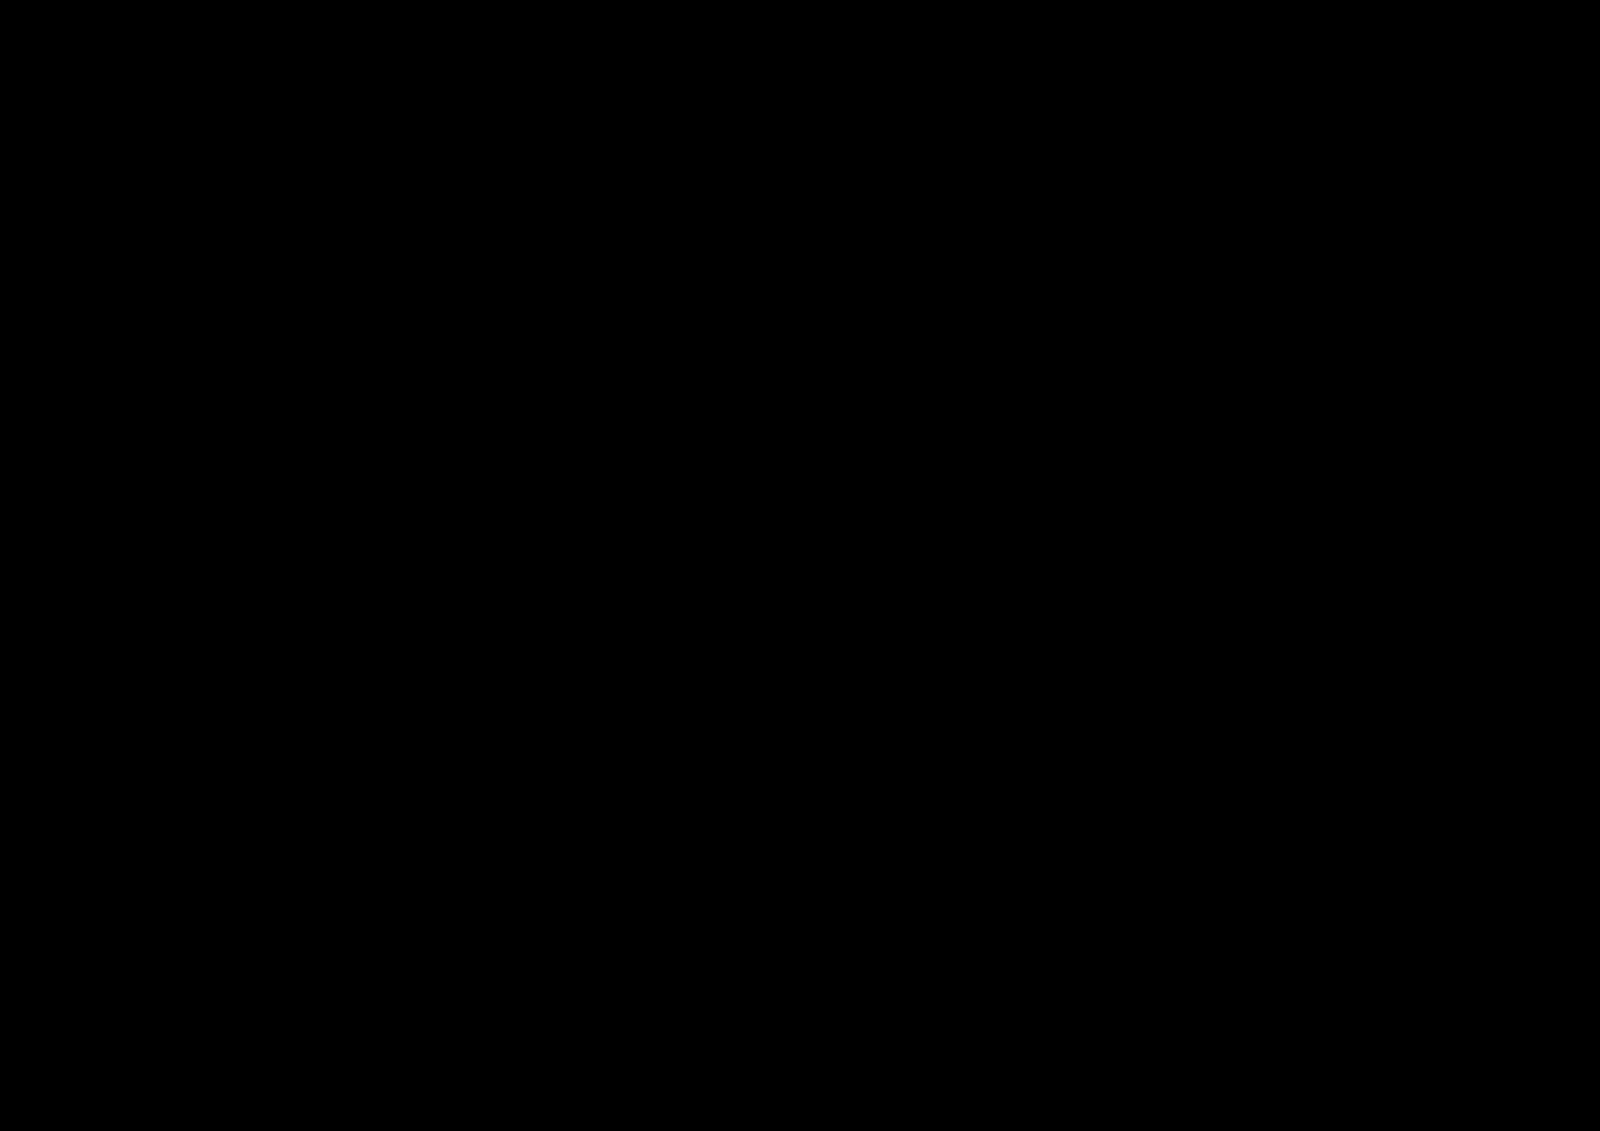 2020050601